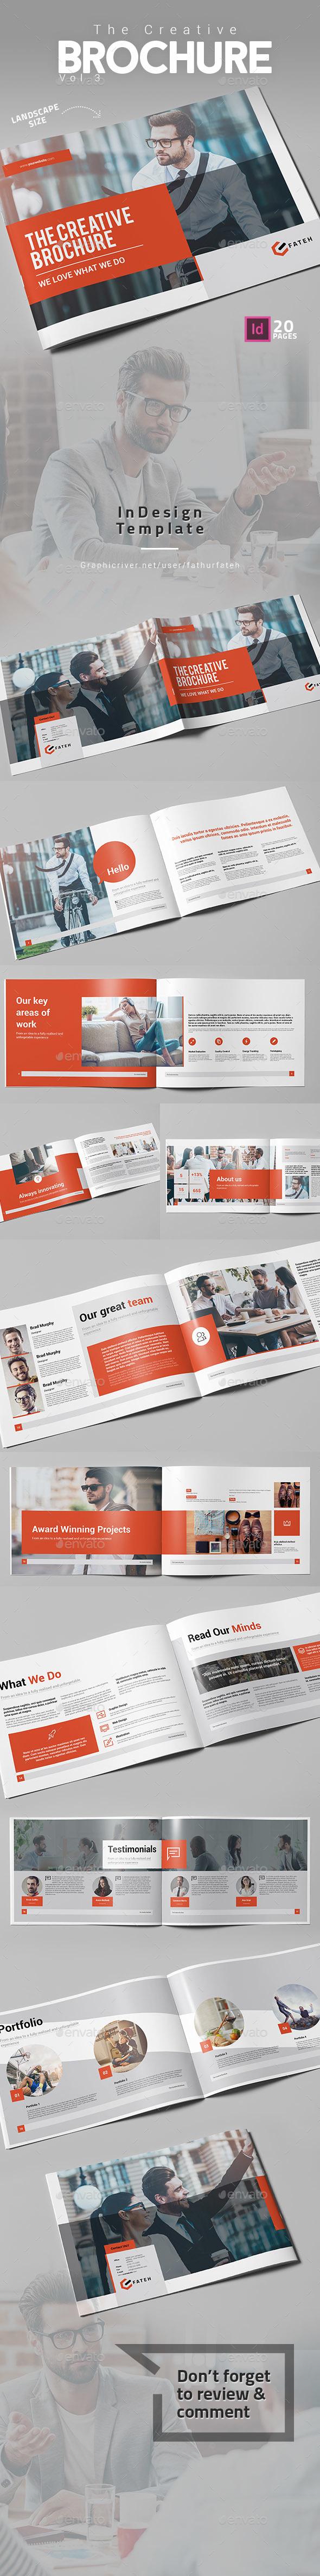 The Creative Brochure Vol.3 Landscape - Corporate Brochures